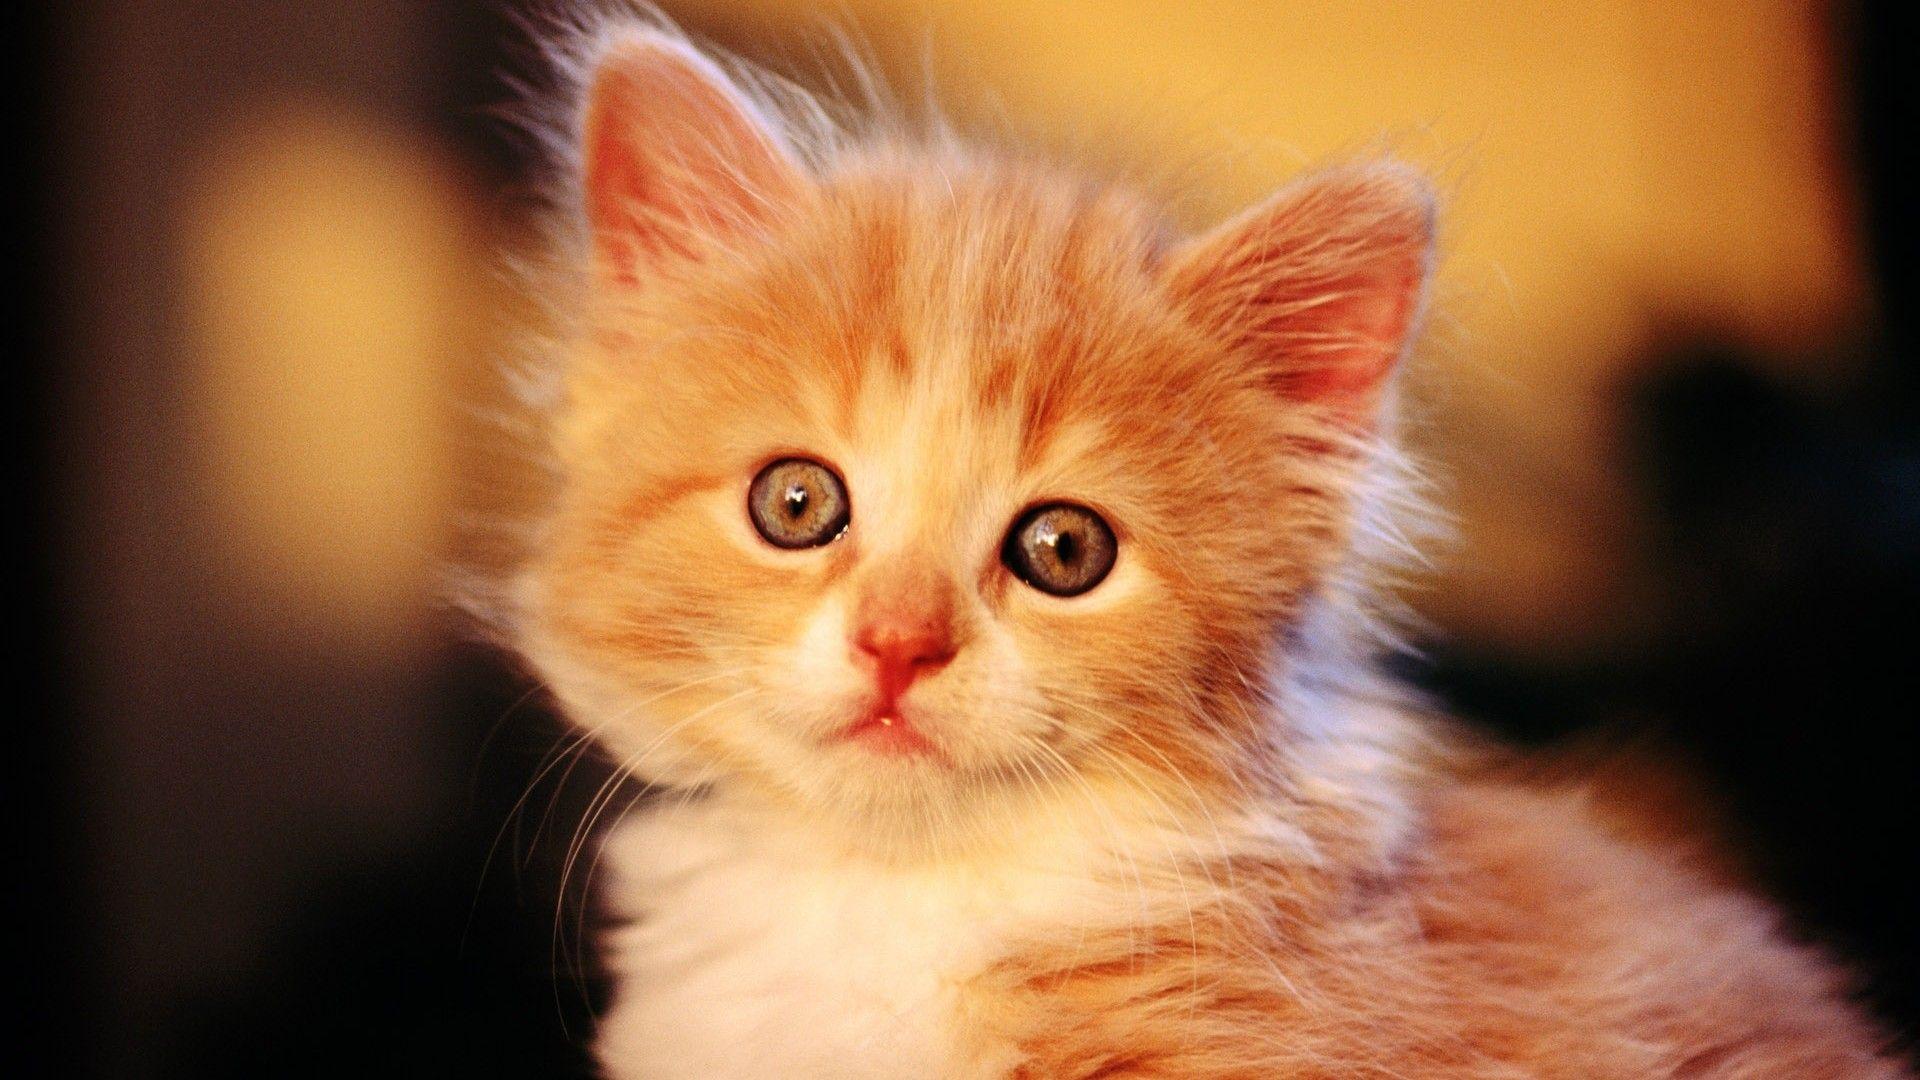 Baby Cat Wallpaper Mobile Viy